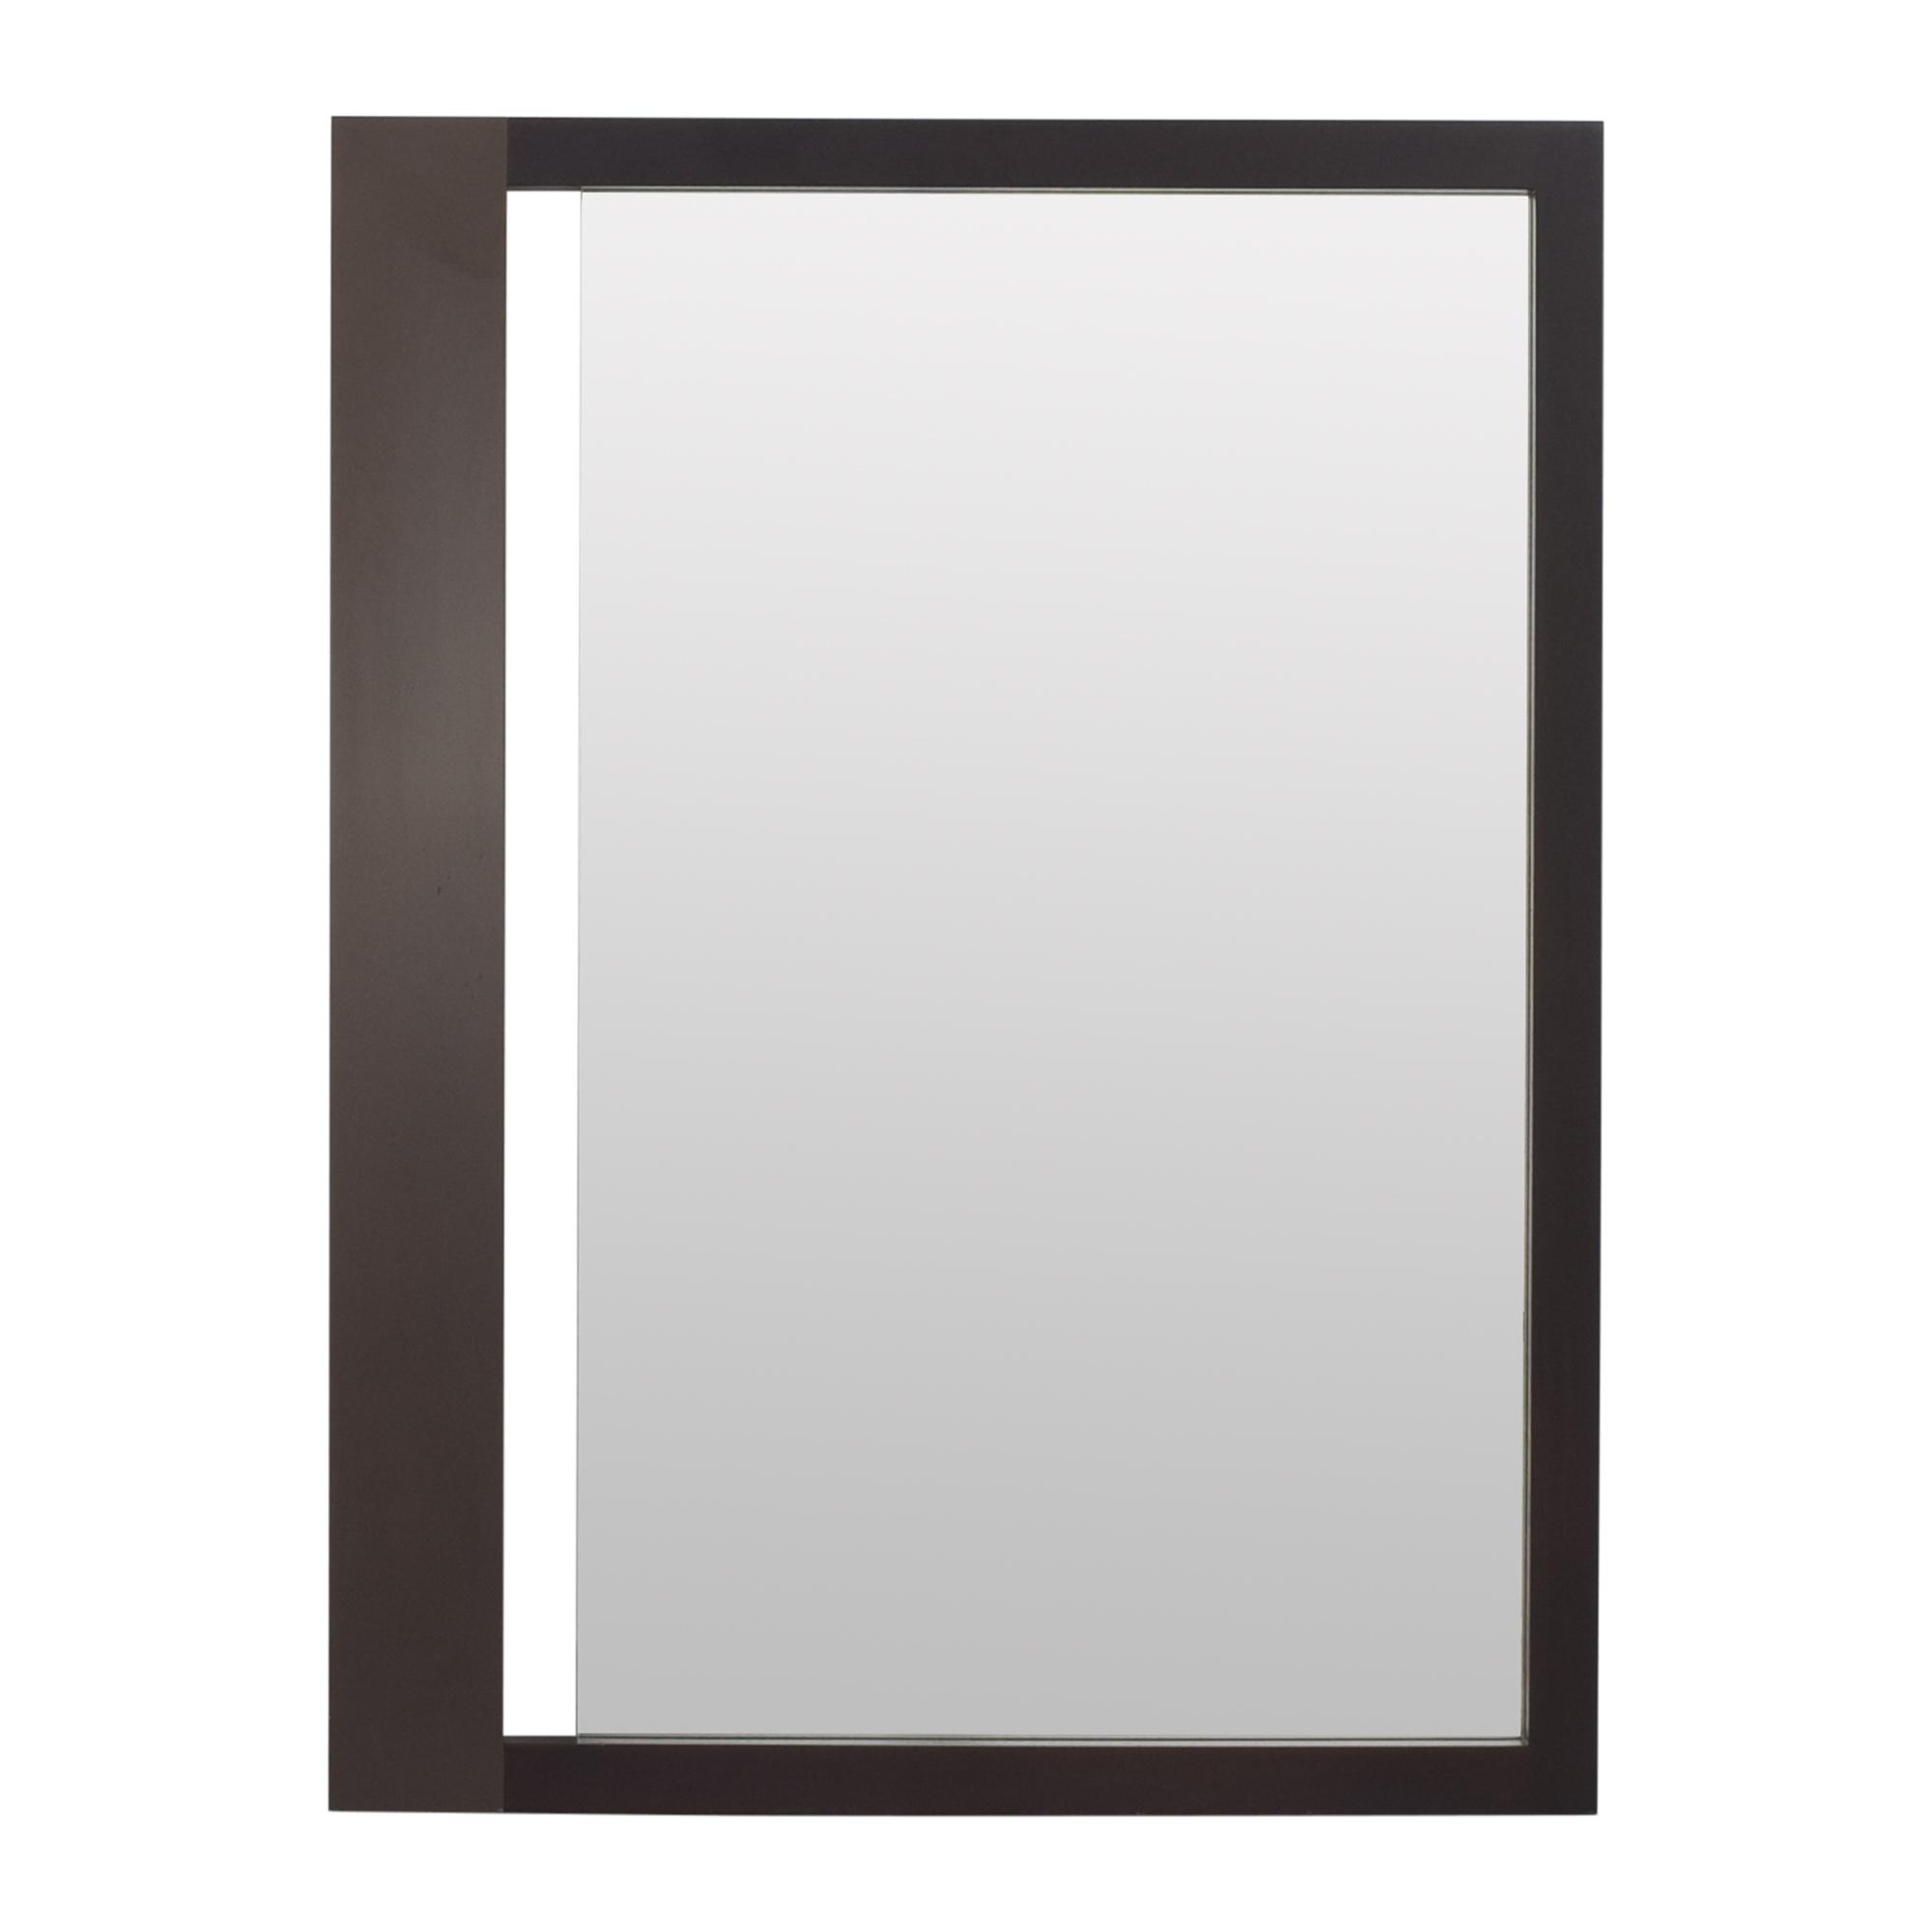 Antoine Proulx Wall Mirror / Decor